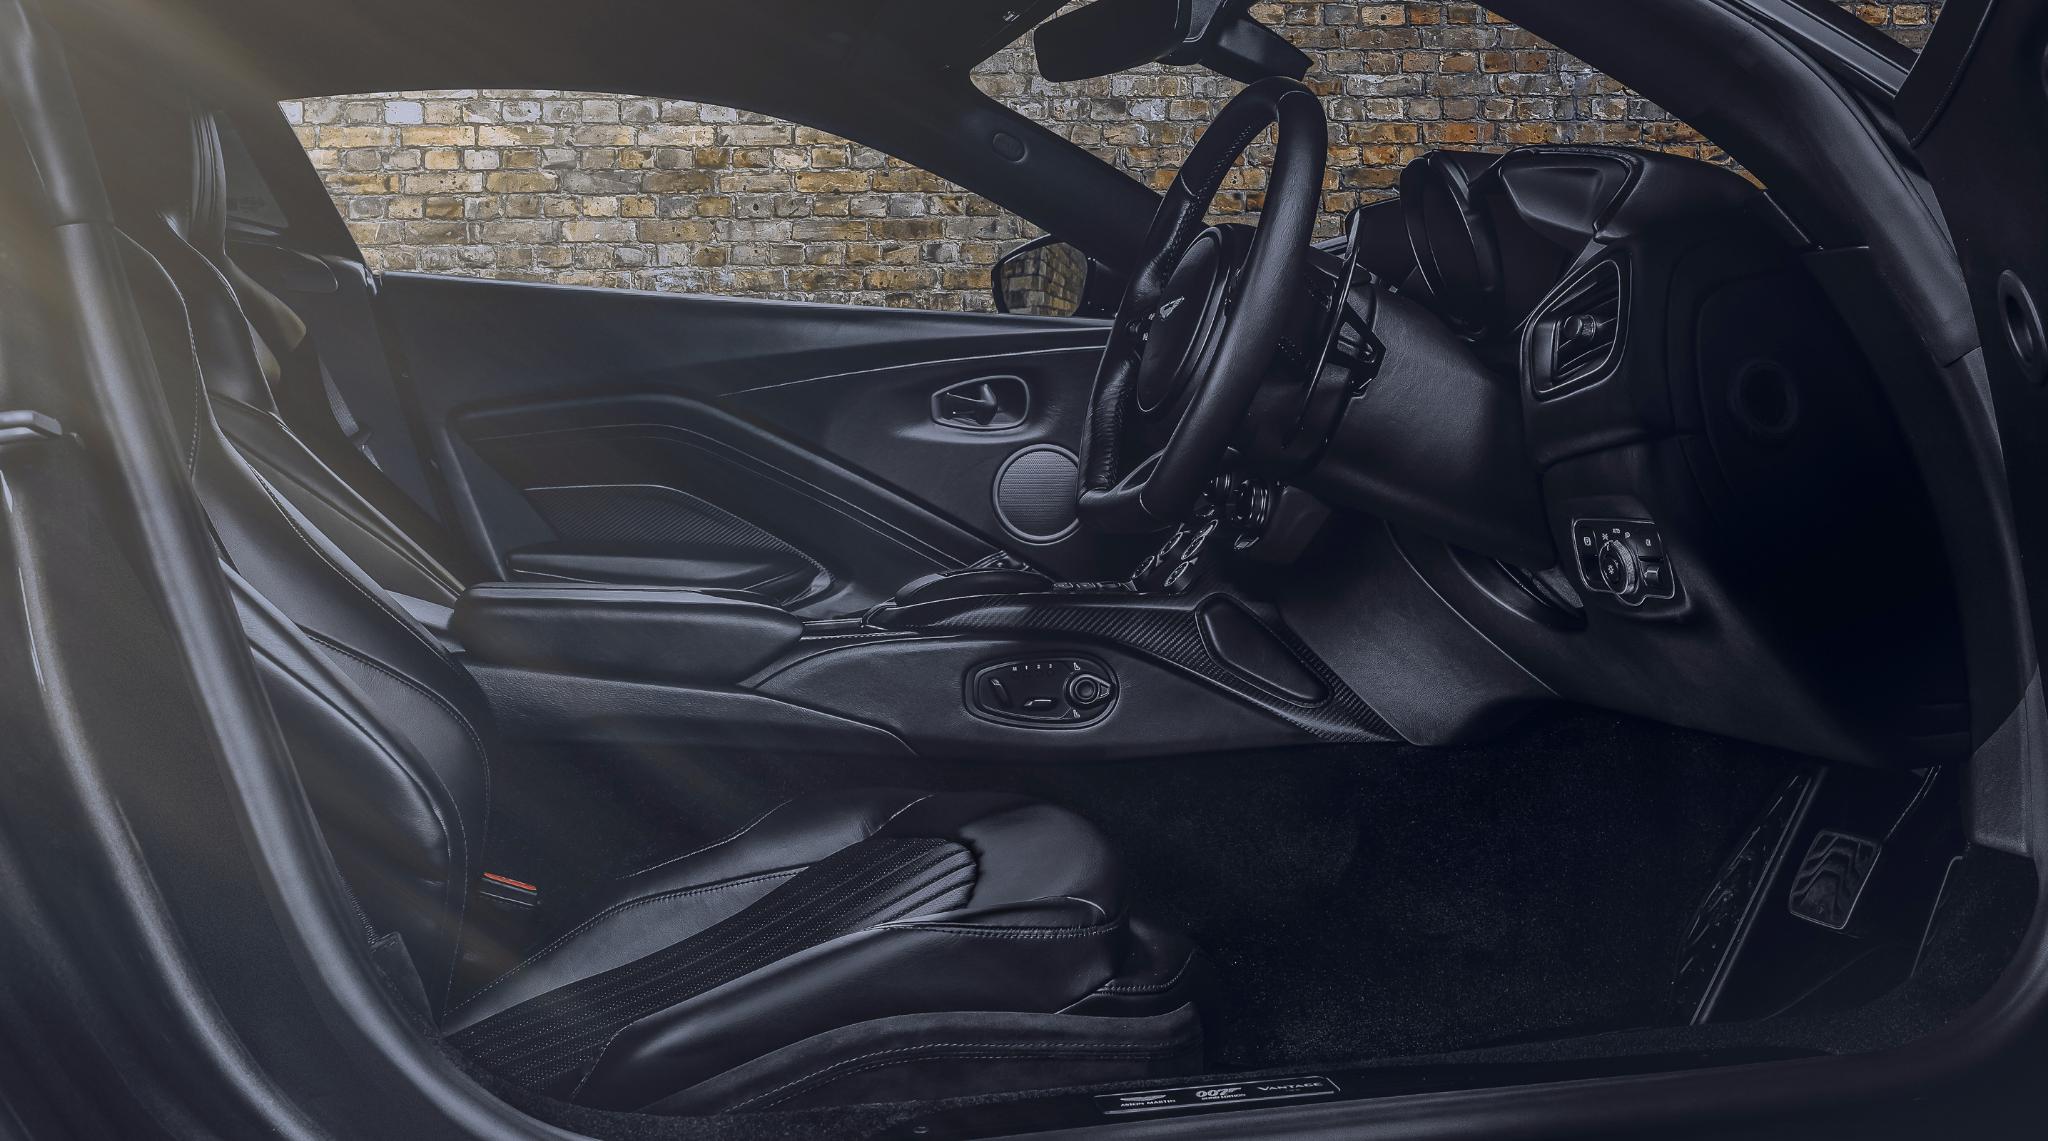 Aston Martin Vantage 007 Edition Interior